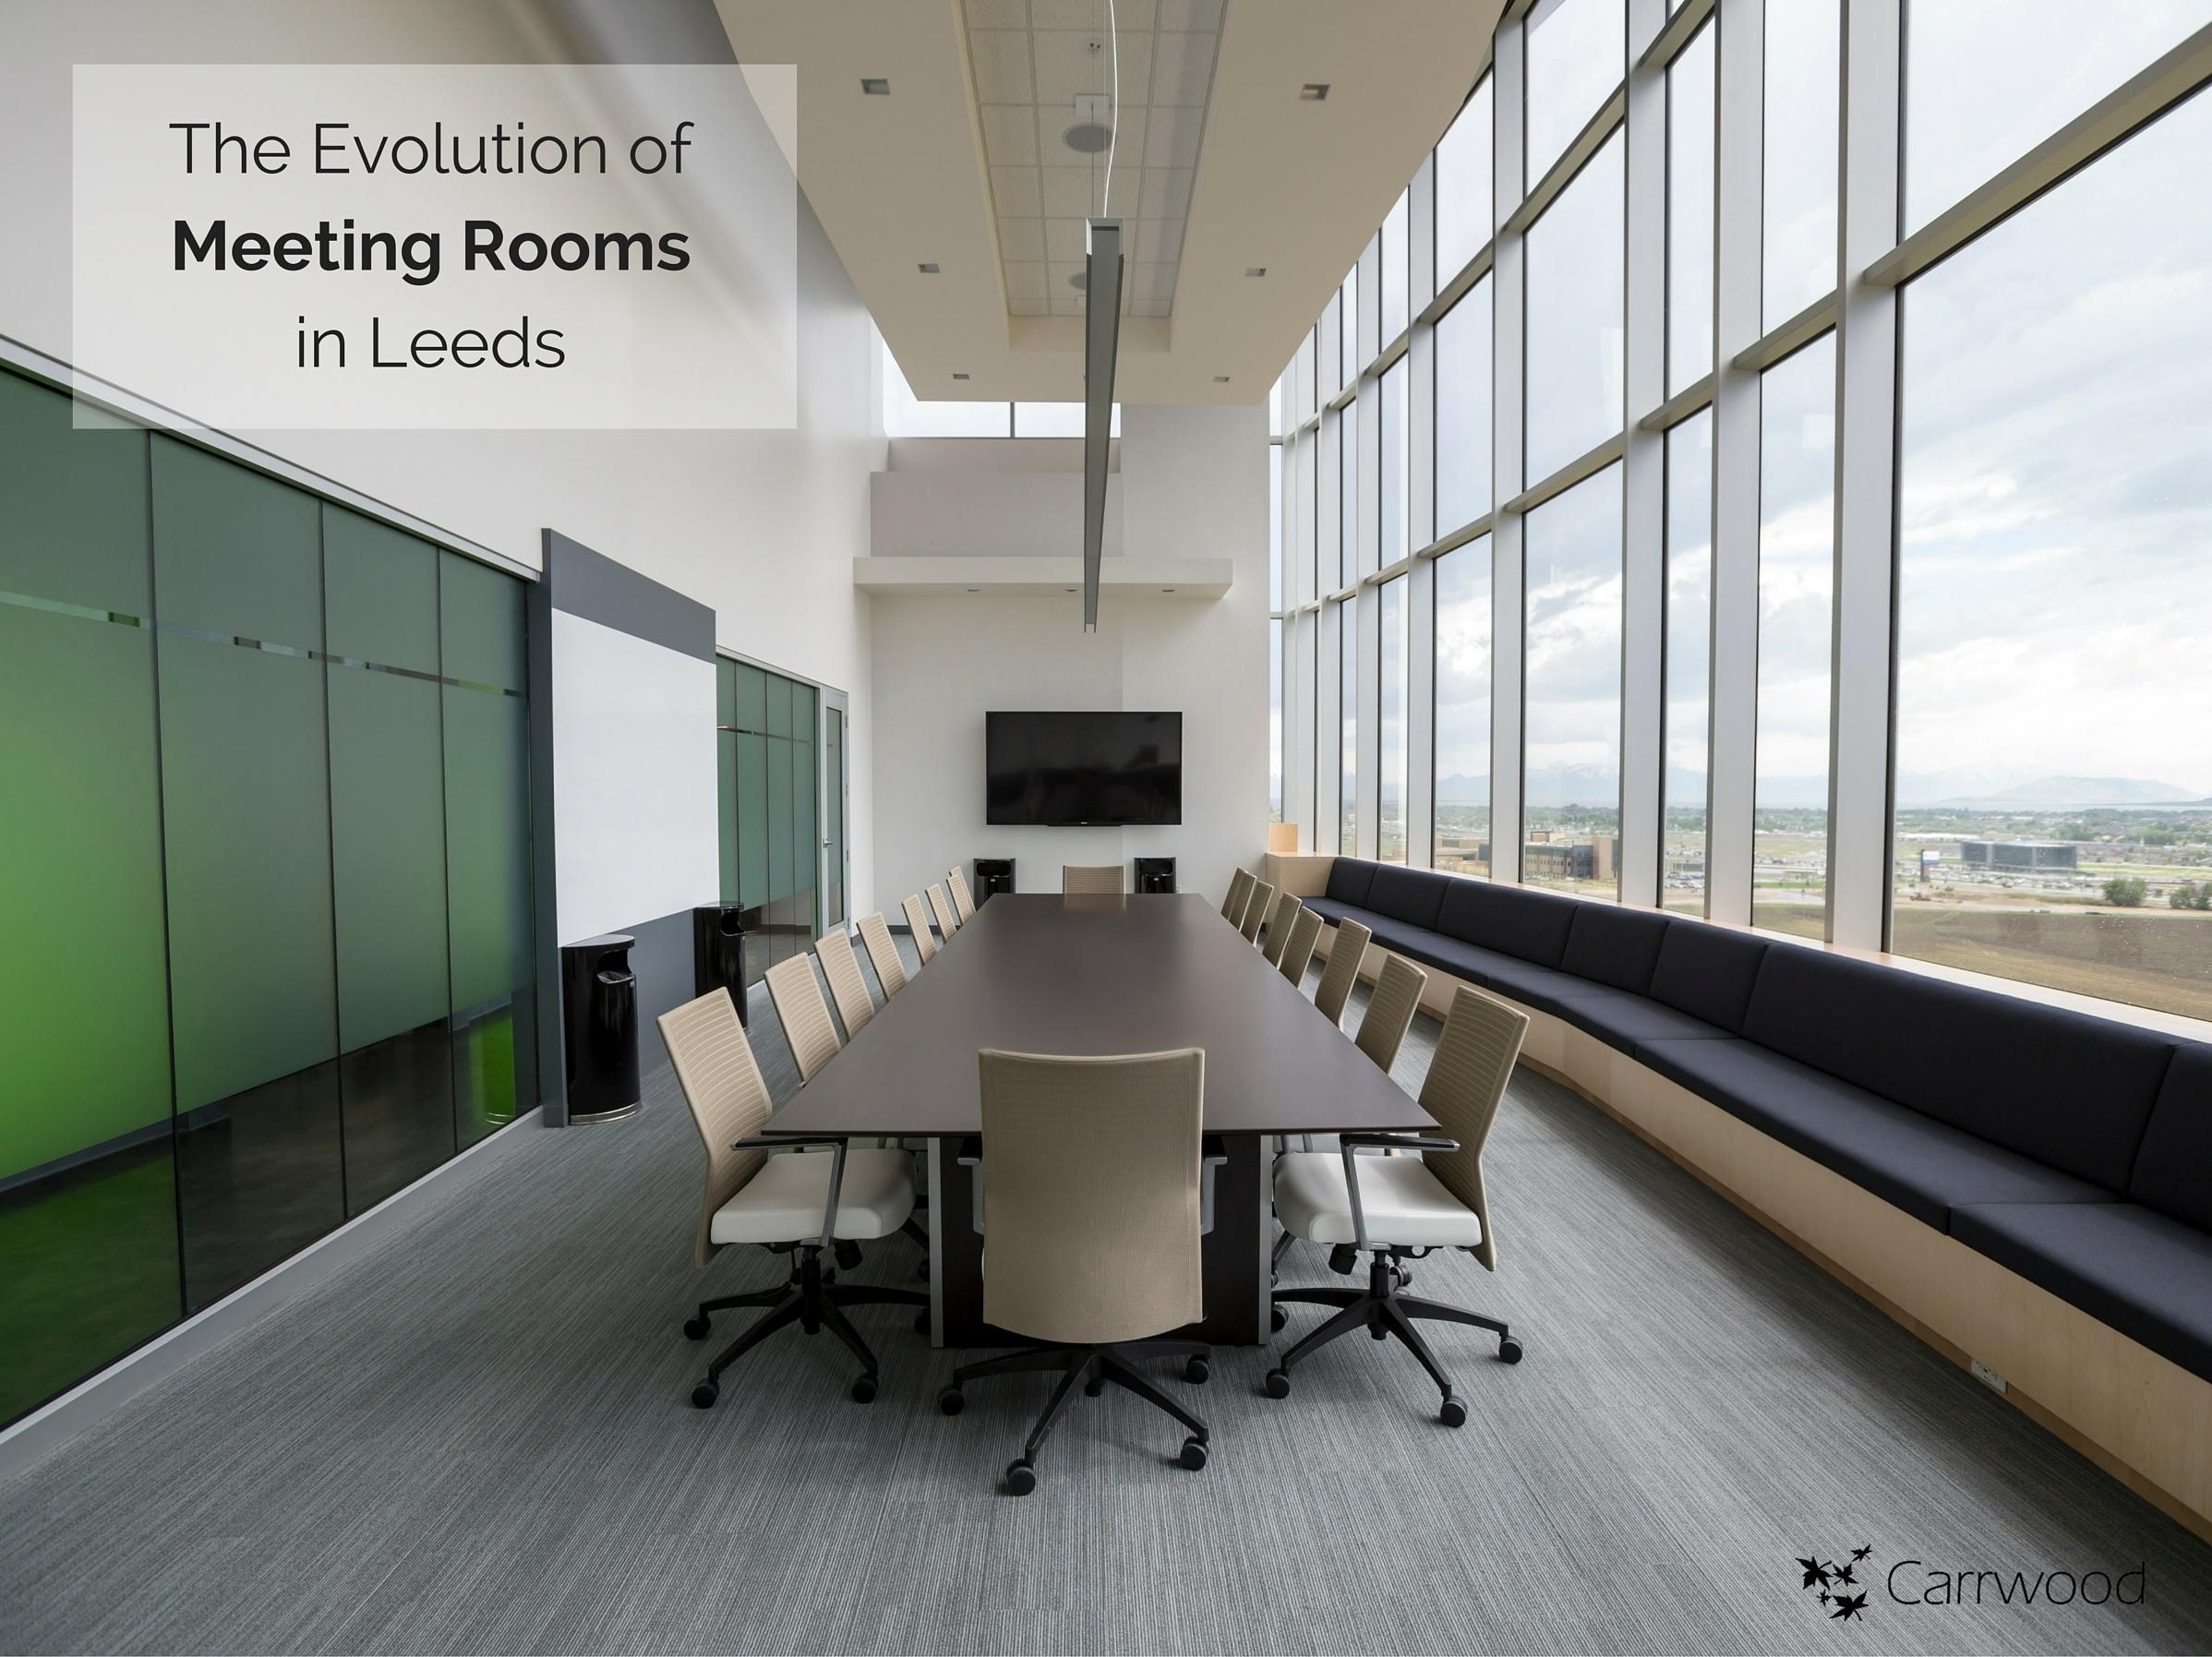 the_evolution_of_meeting_rooms_in_leeds.jpg